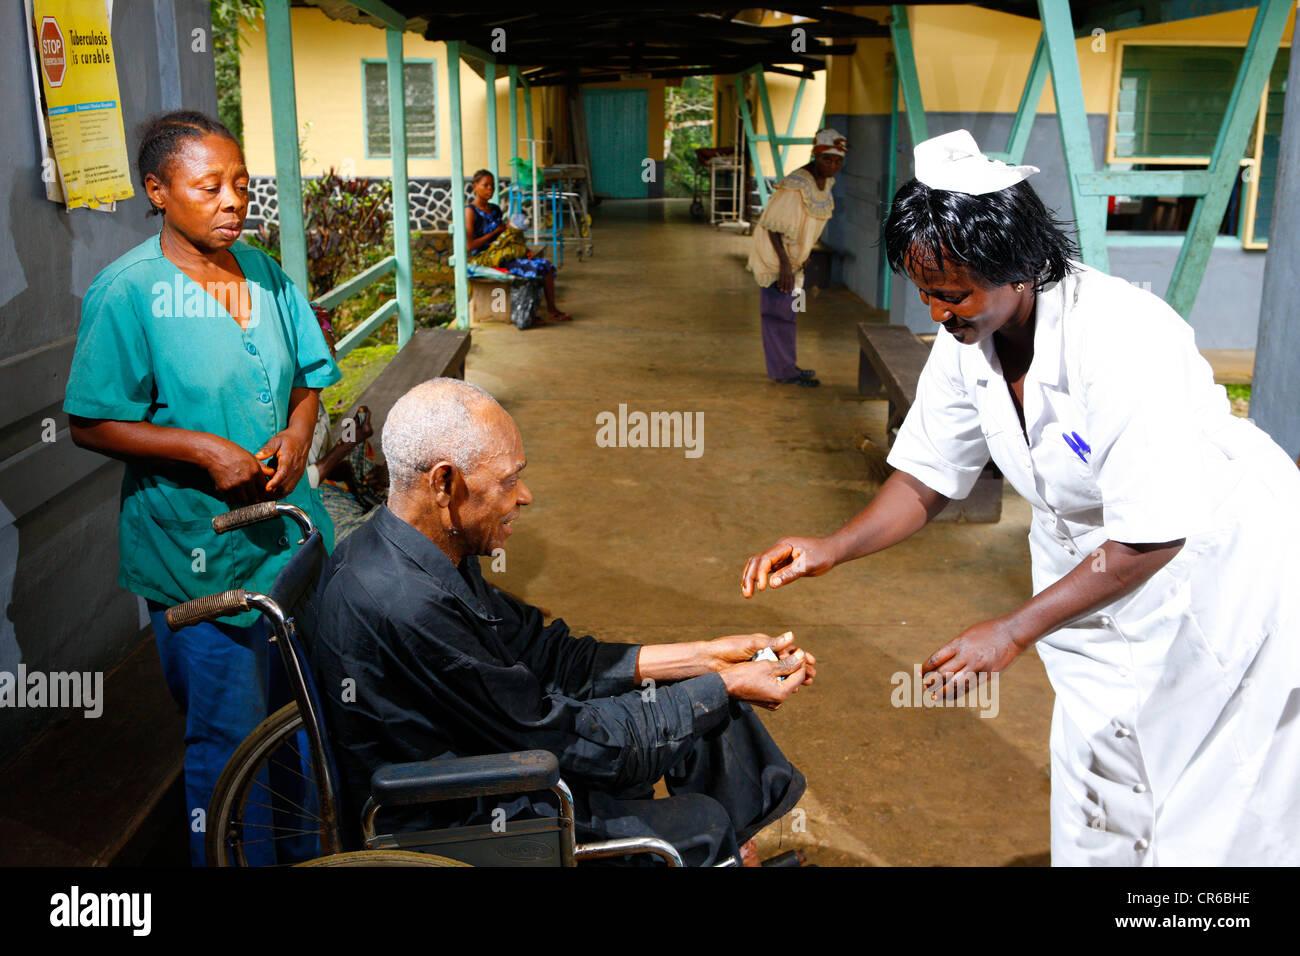 Leper receiving medication, TB and leprosy settlement, Manyemen, Cameroon, Africa - Stock Image